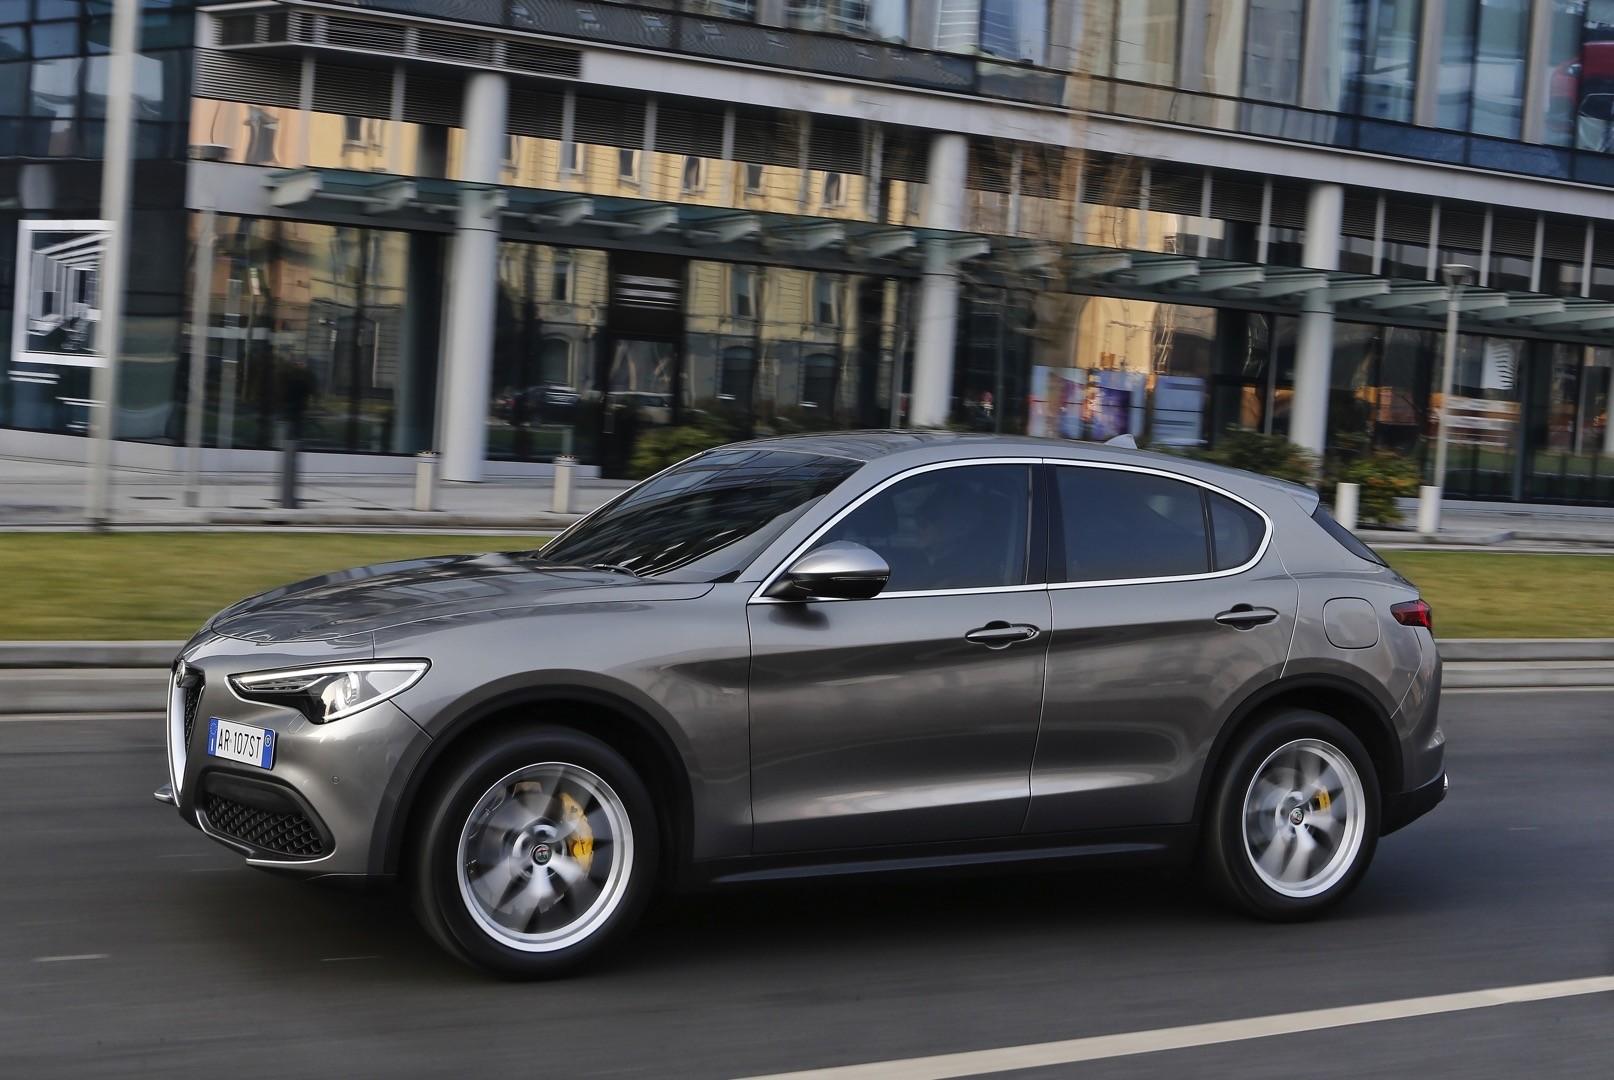 New Maserati SUV Coming By 2020 With Alfa Romeo ...